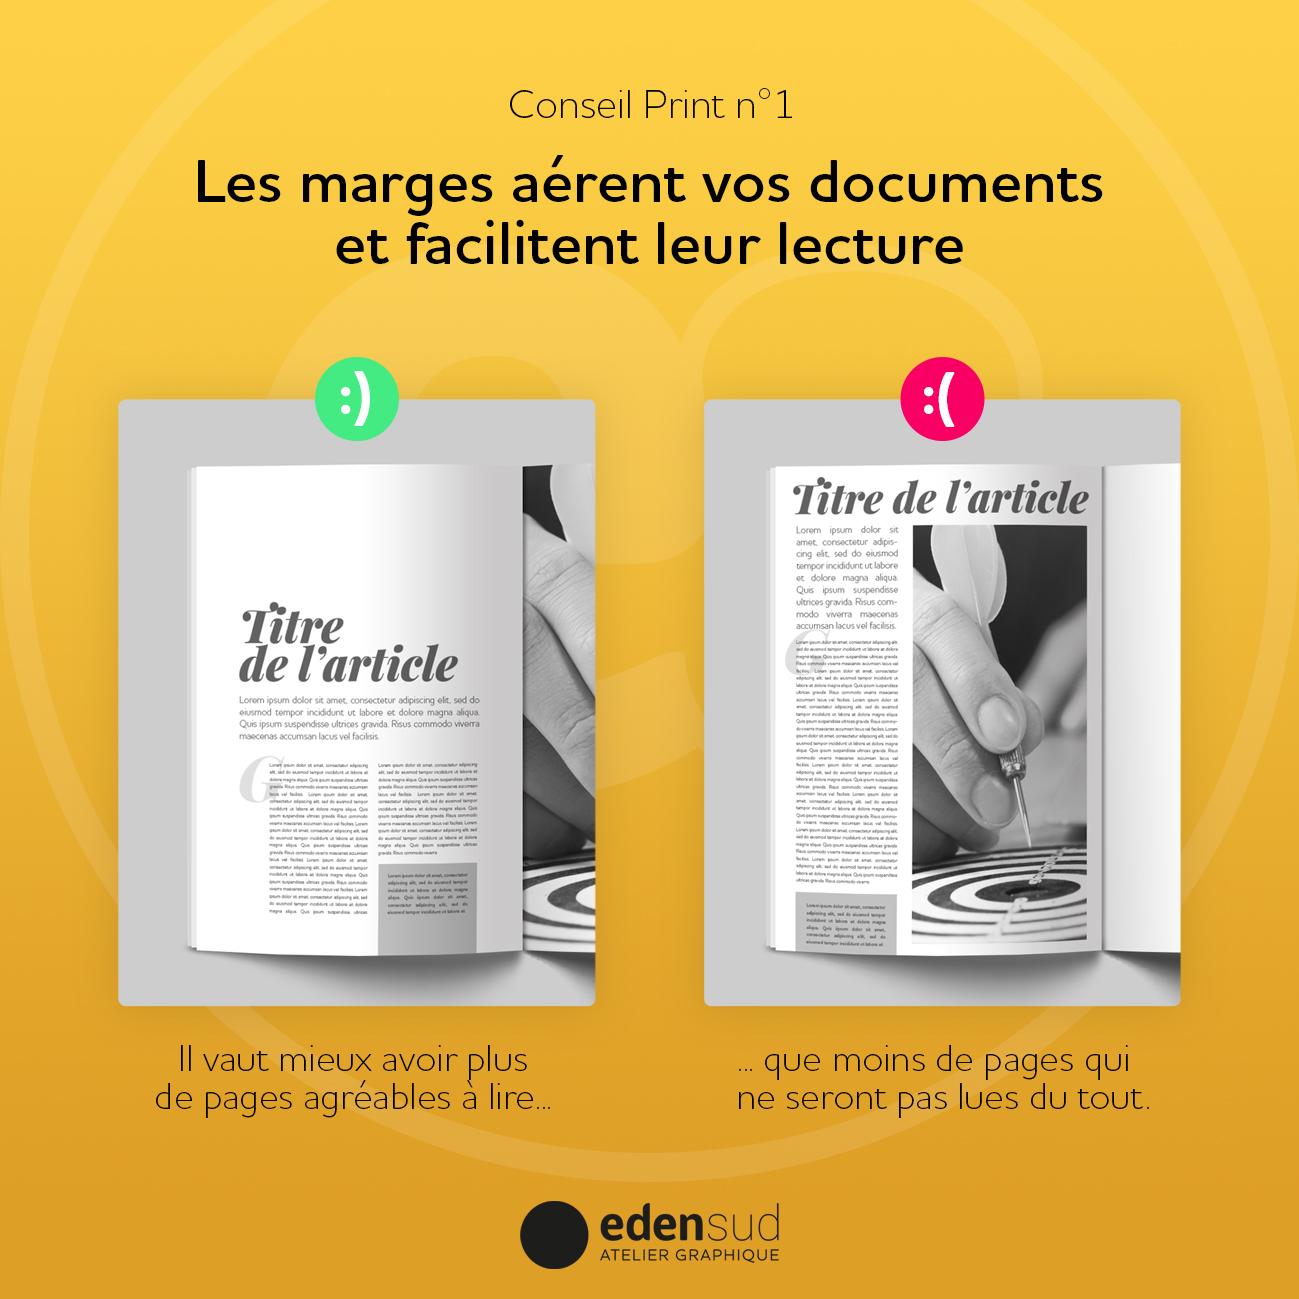 Edensud_Print_01